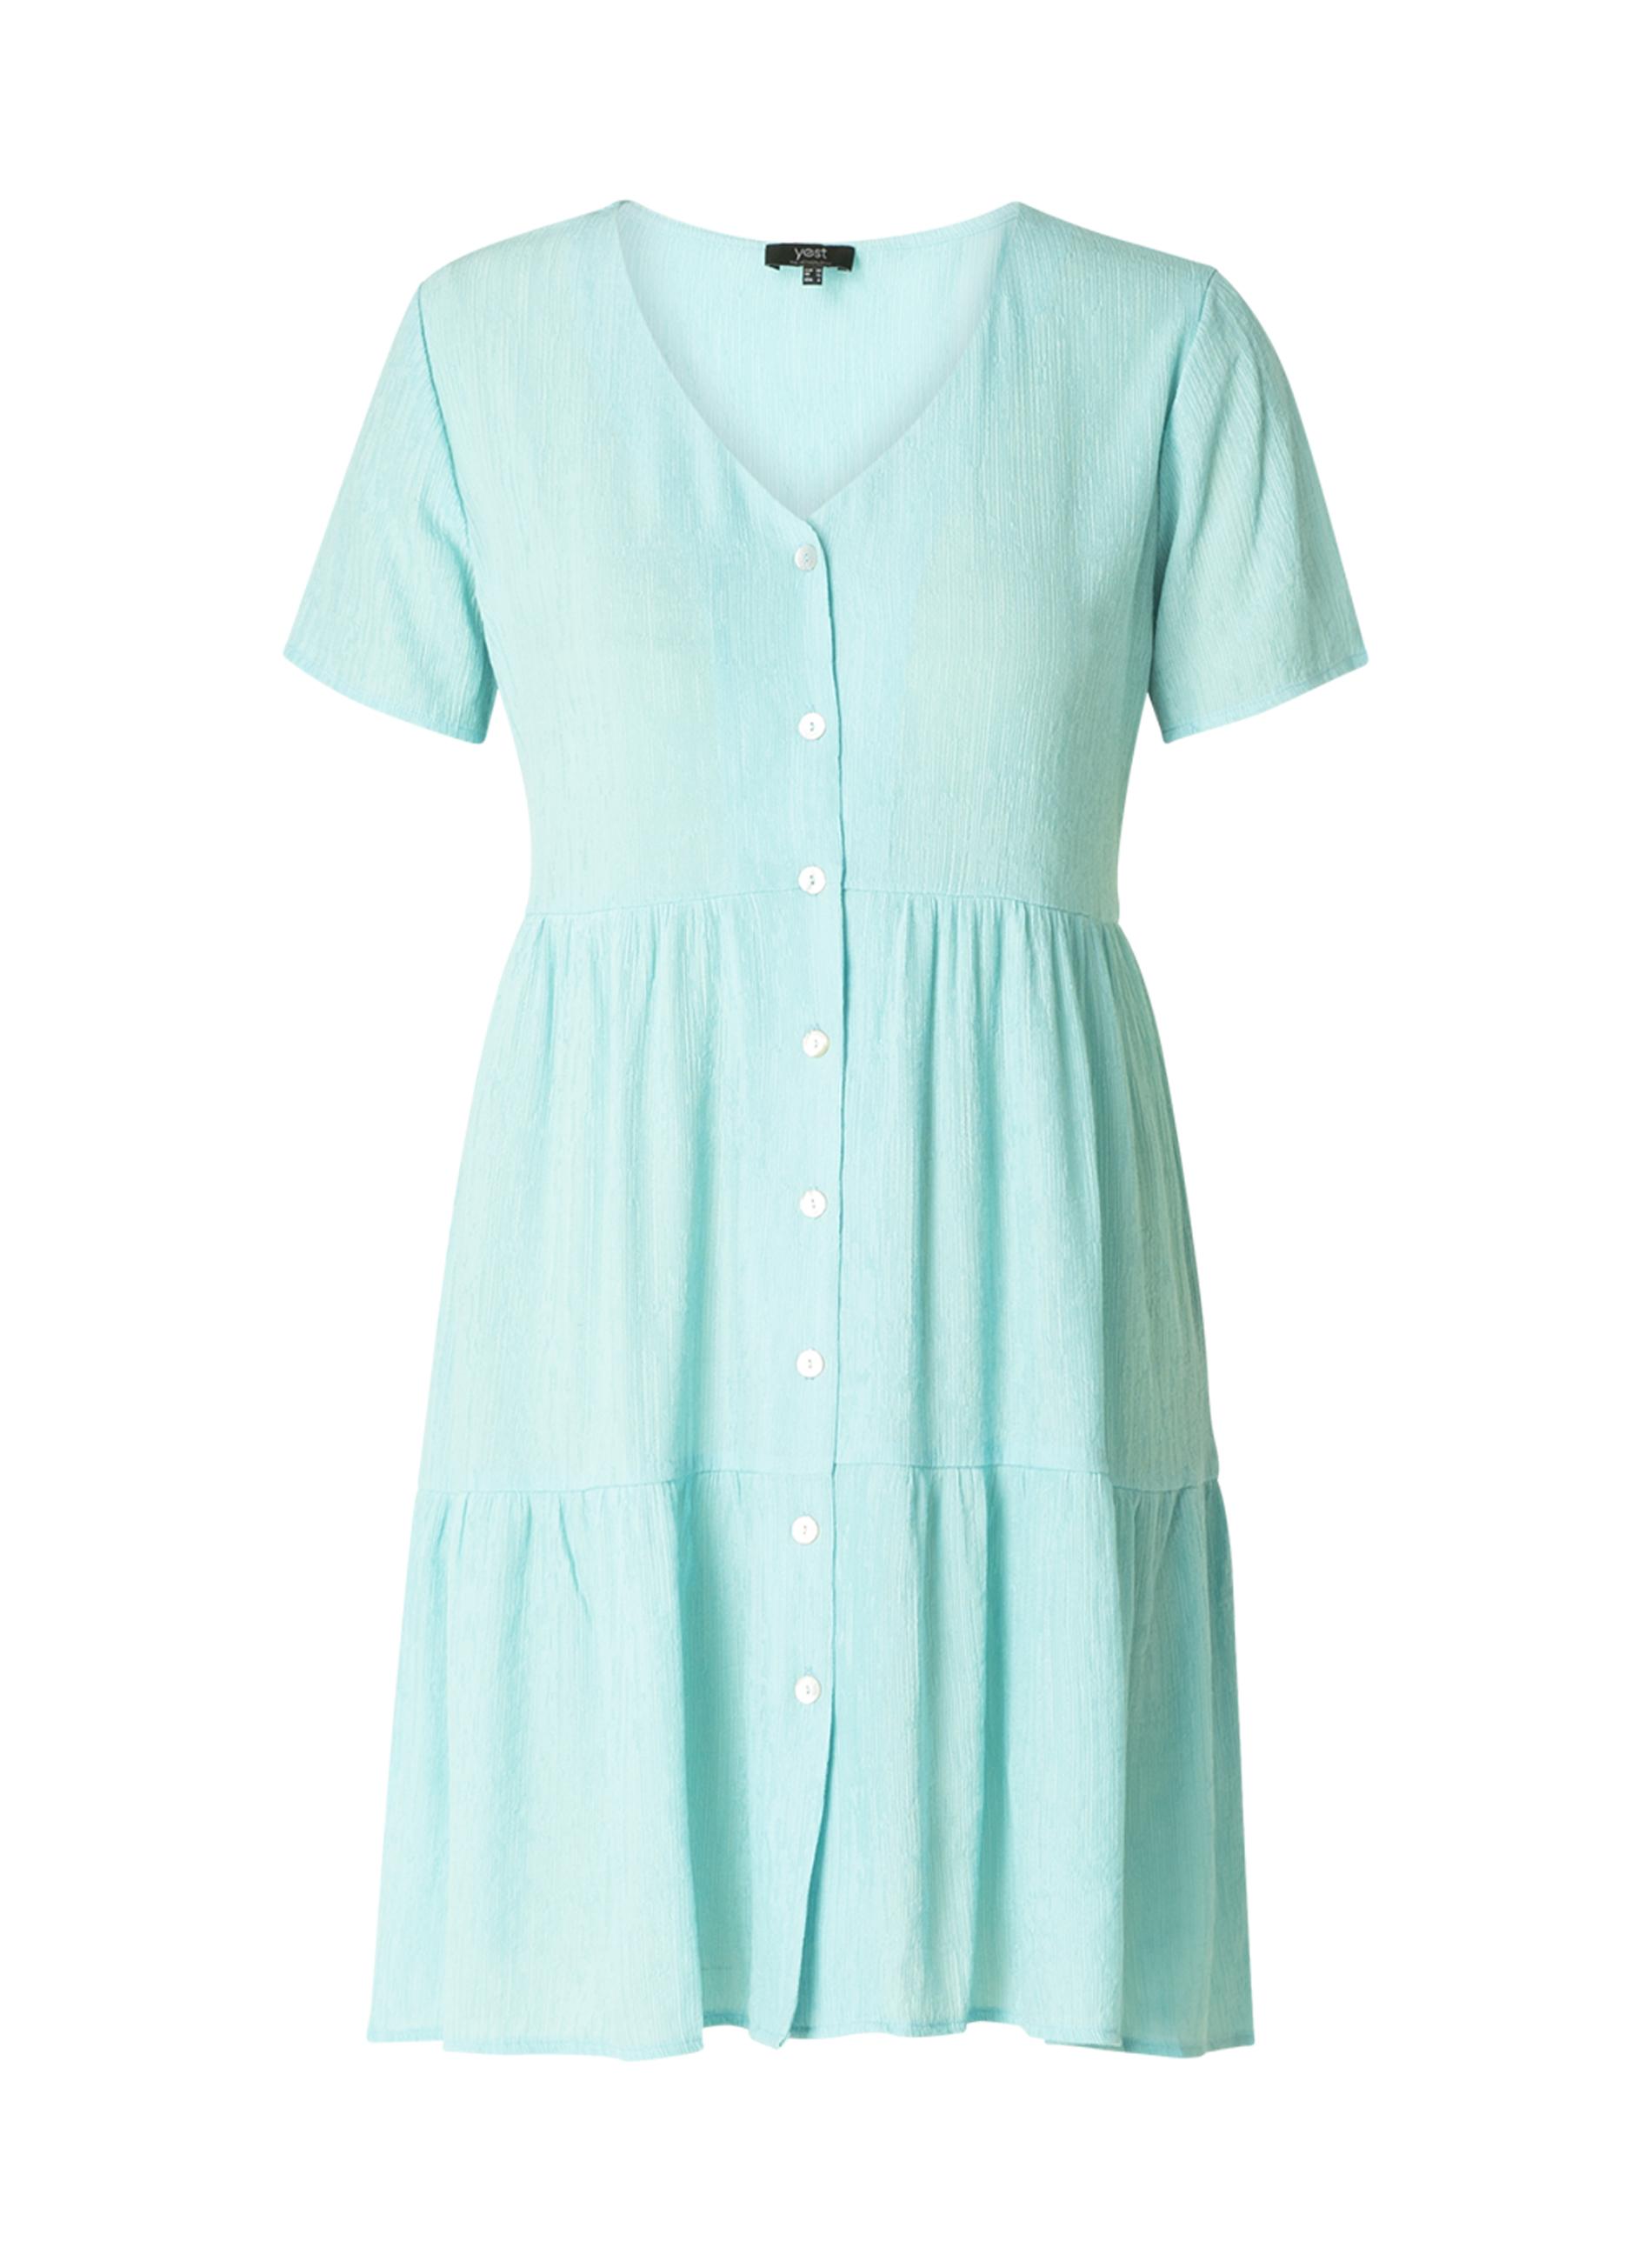 Yest jurk Kristen 95  cm